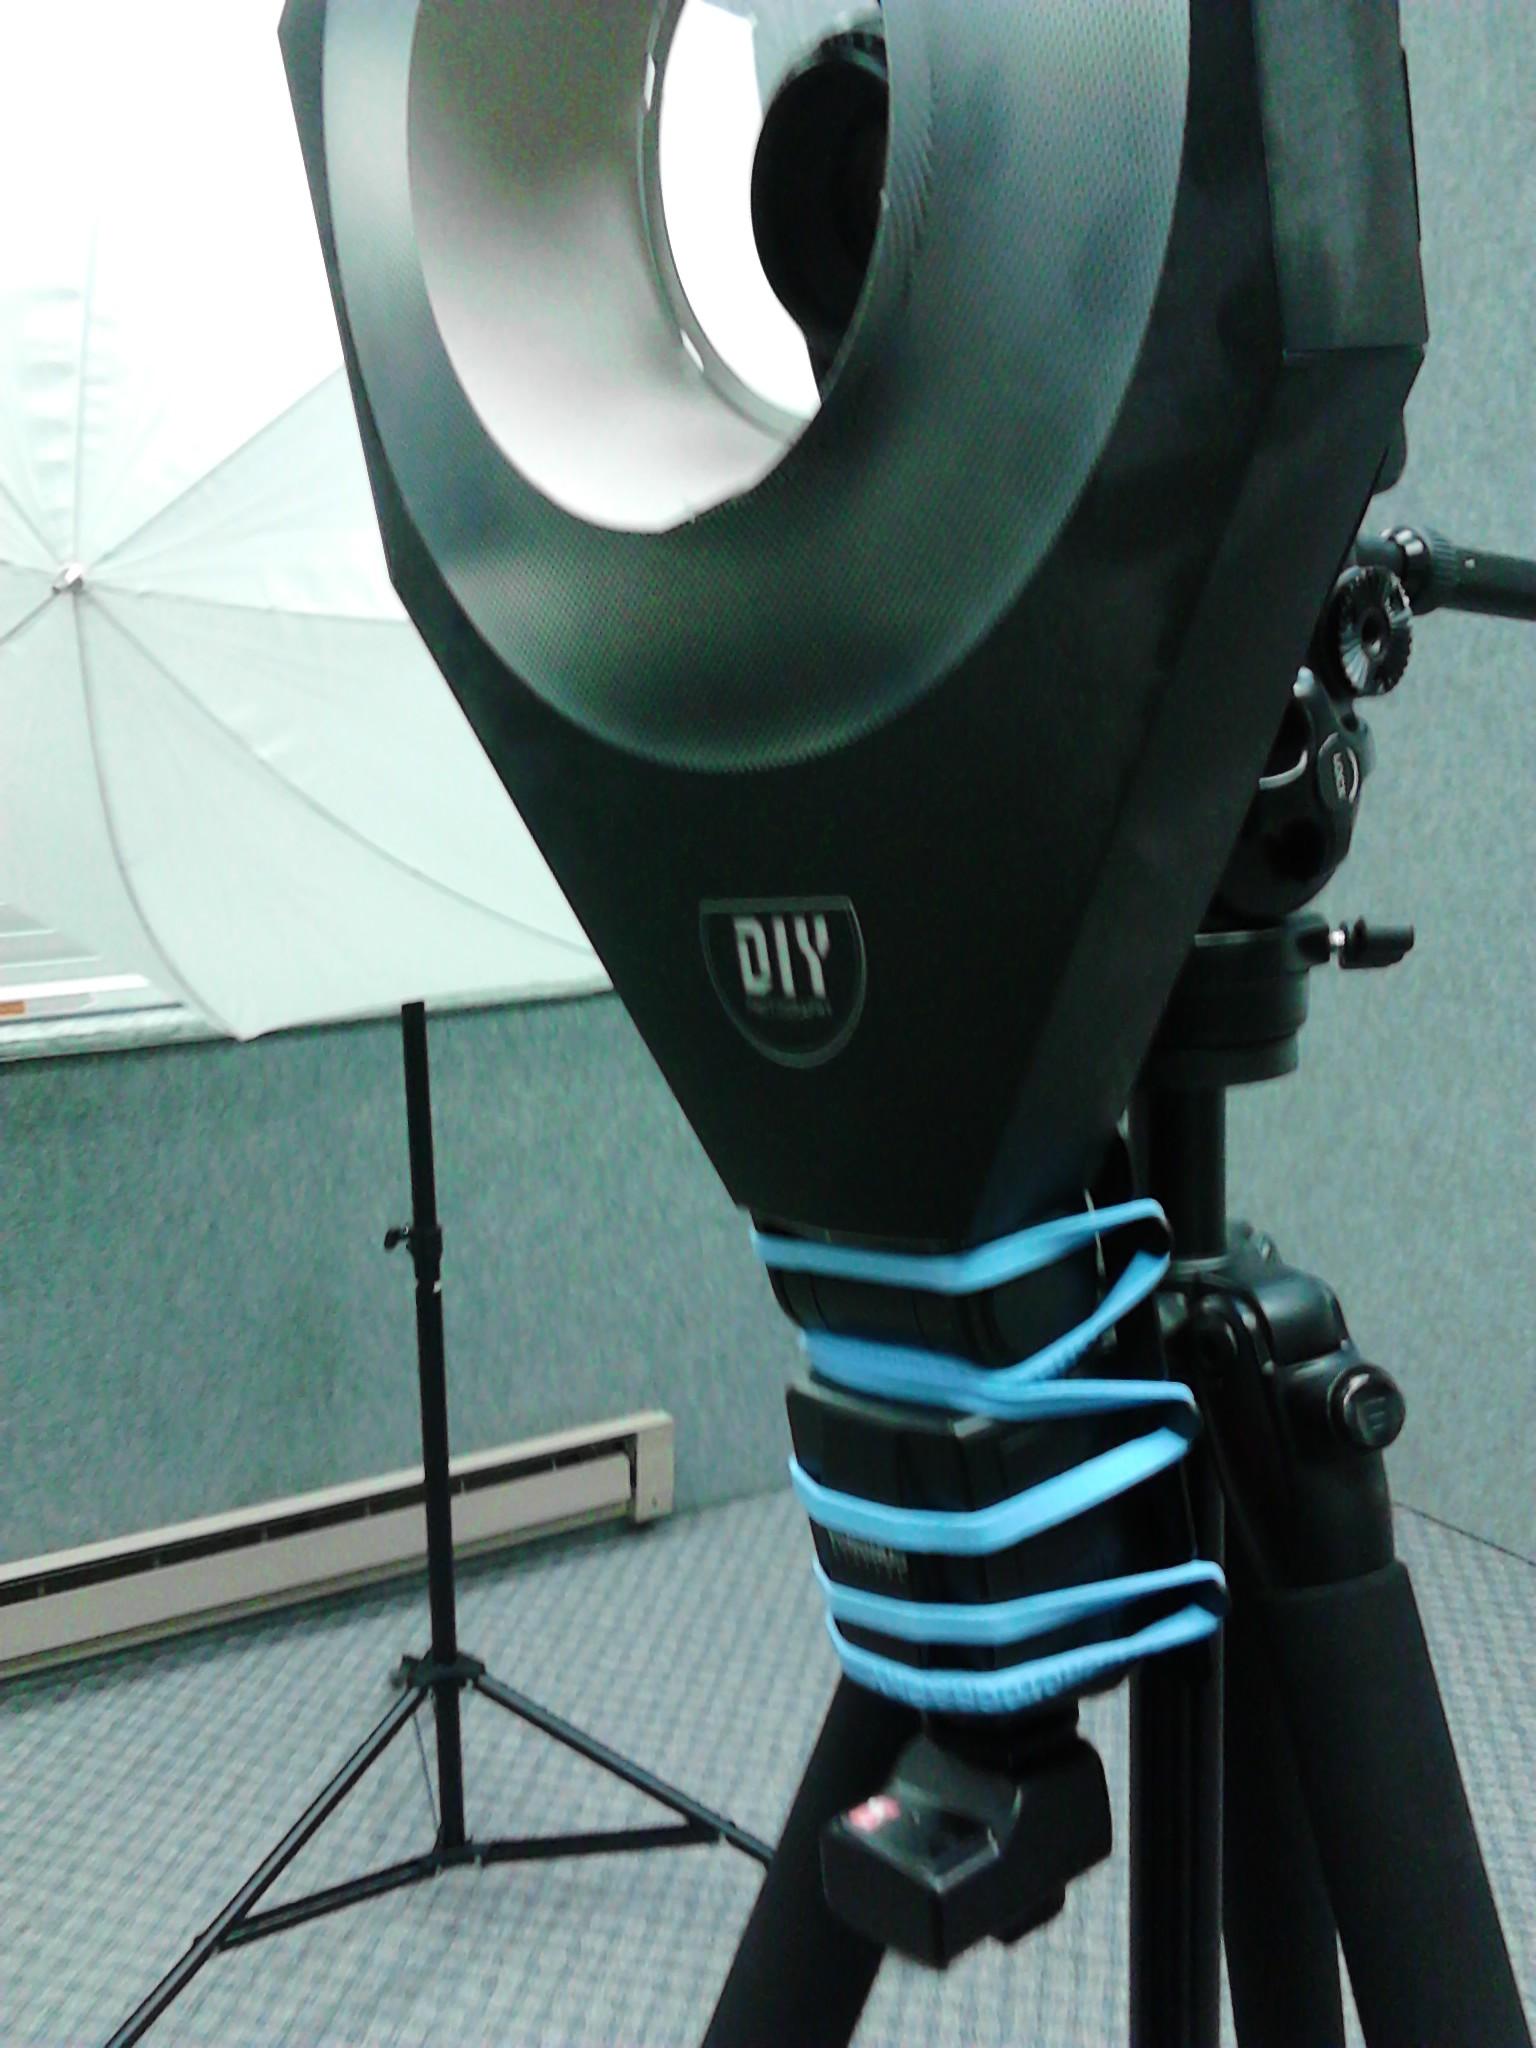 DIY Ring Light - DIYPhotography.com